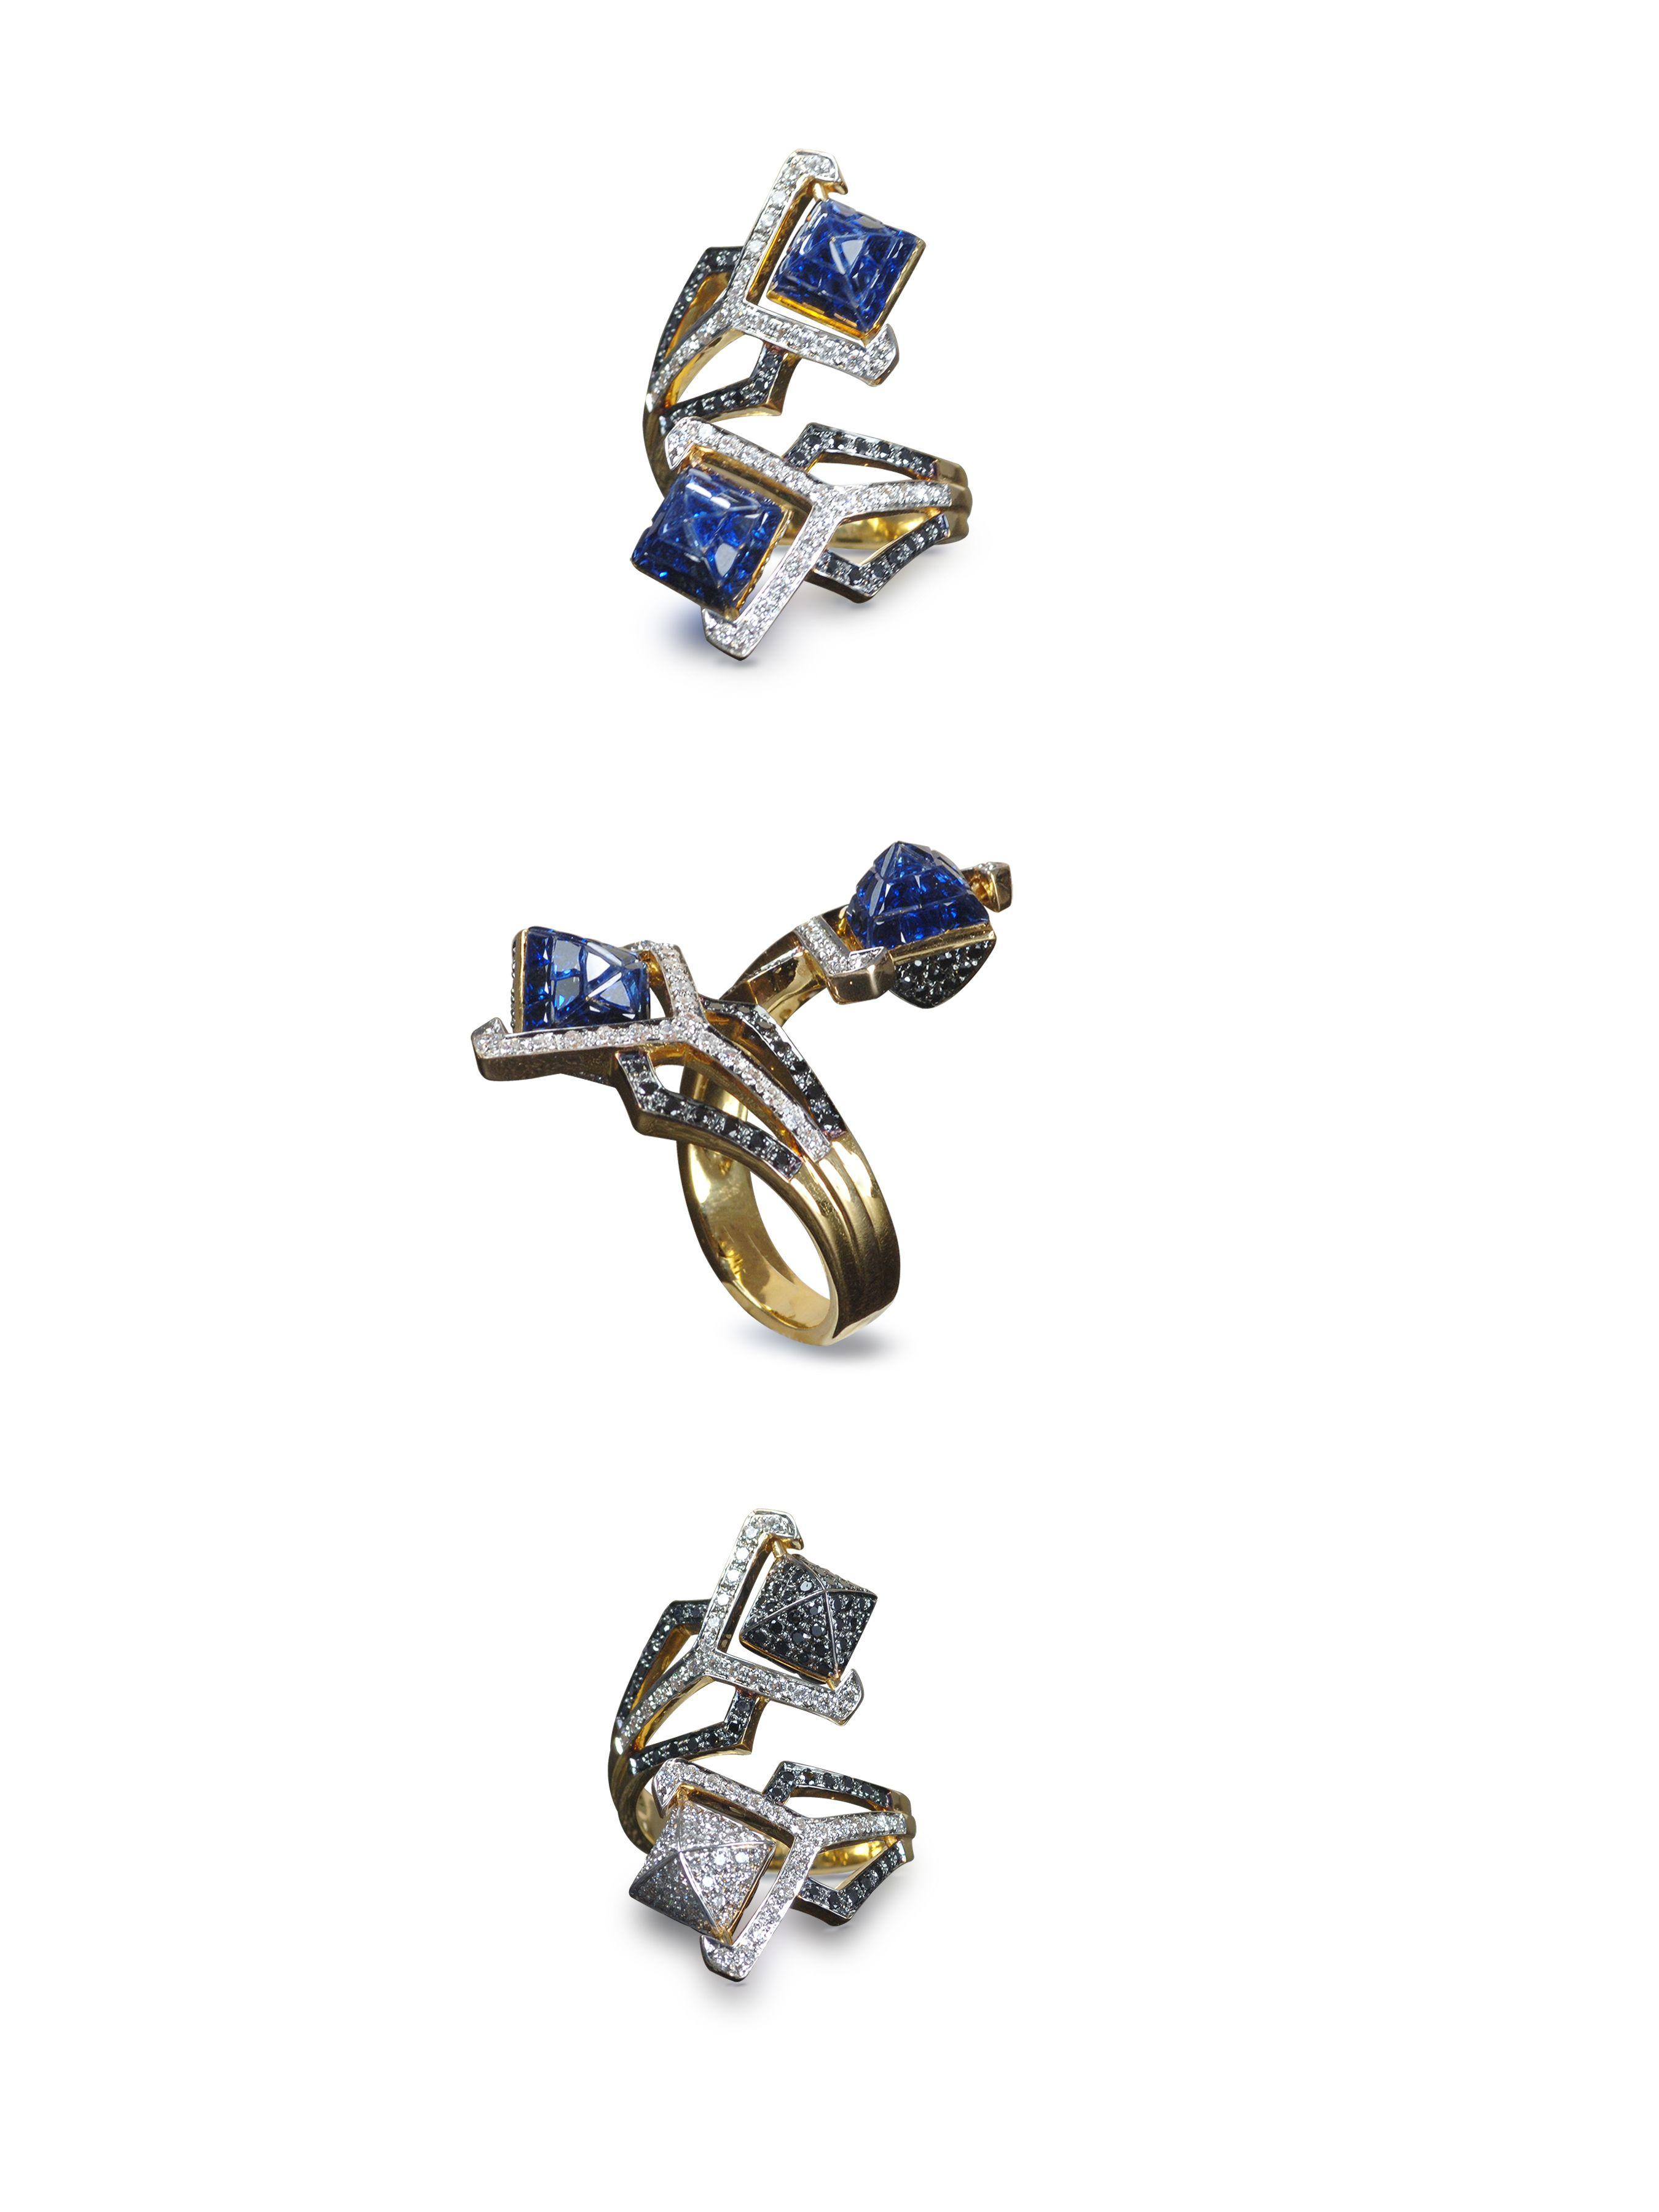 by sharart design -Sharlinn Liew Invisible setting, blue sapphire & diamond Ring 18K yellow gold pirouetting pyramid